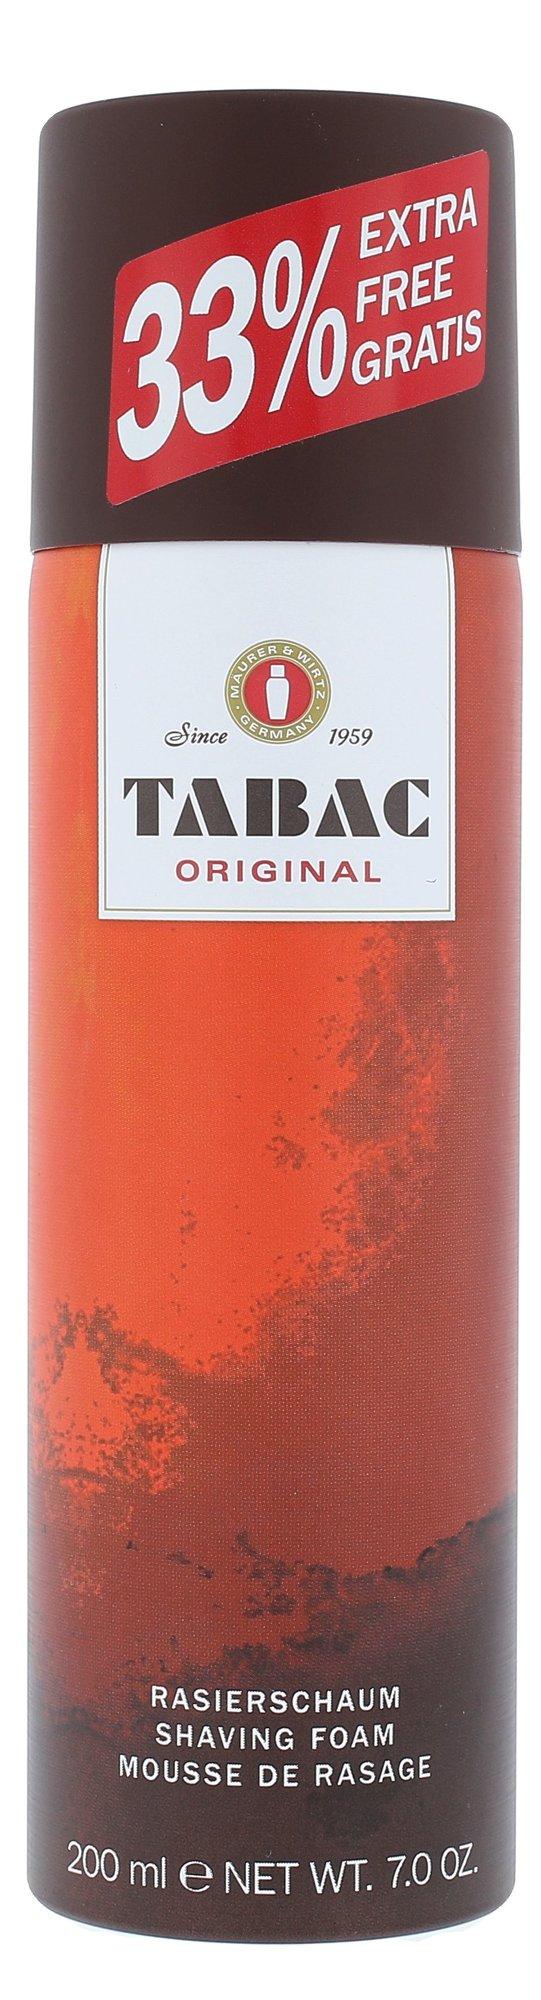 Tabac Original Shaving foam 200ml